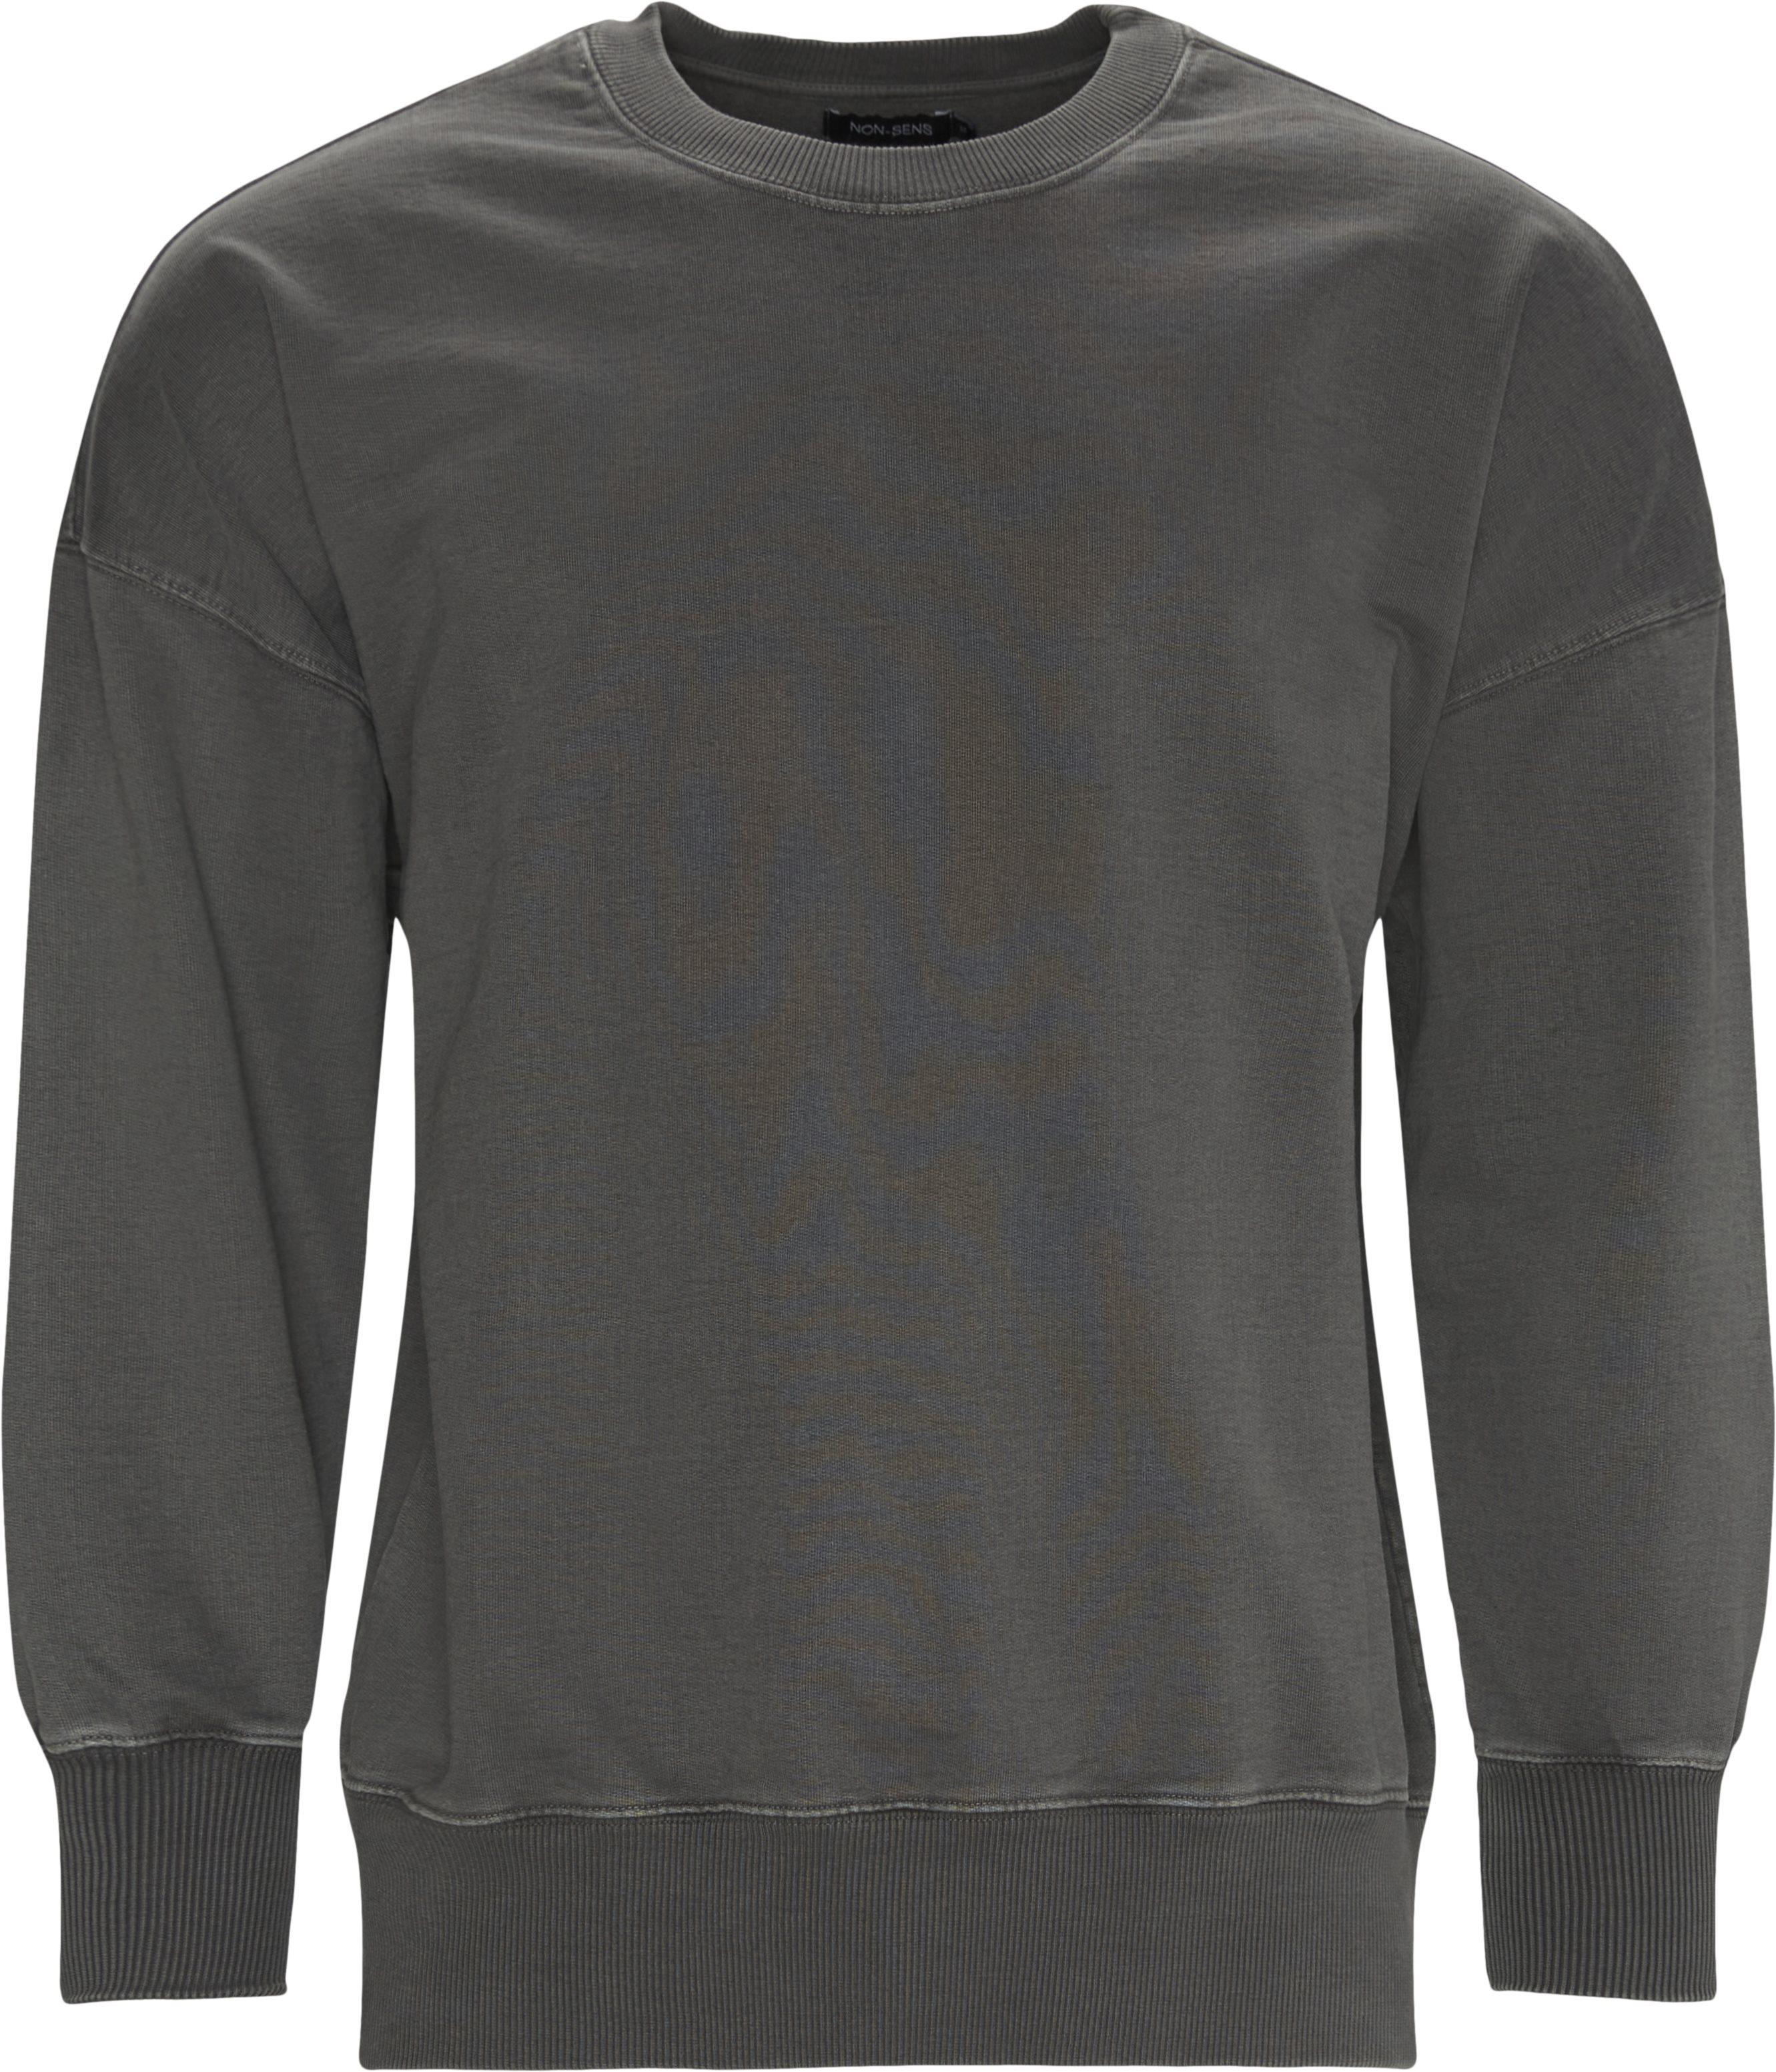 Caruso Crewneck Sweatshirt - Sweatshirts - Regular - Grå